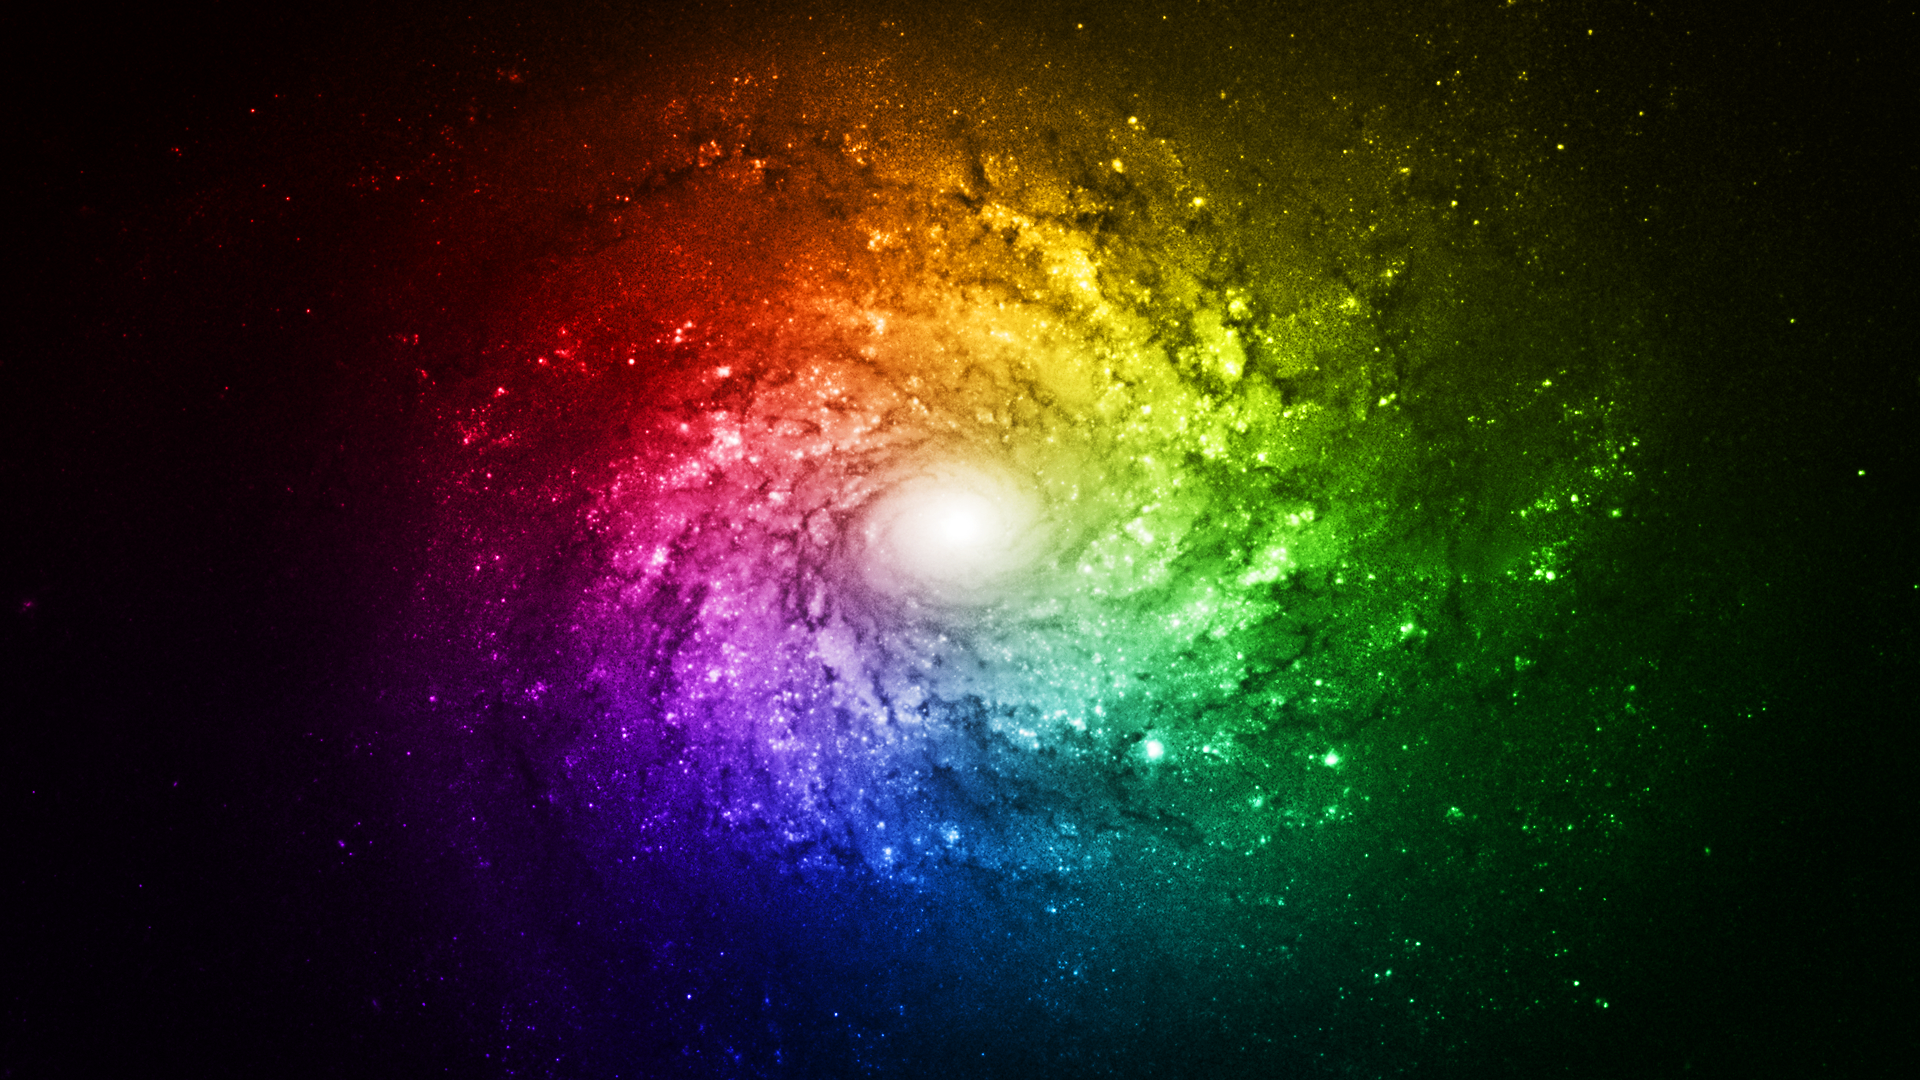 Rainbow Galaxy Bright Wallpaper Full HD by RainbowChipsette on DeviantArt